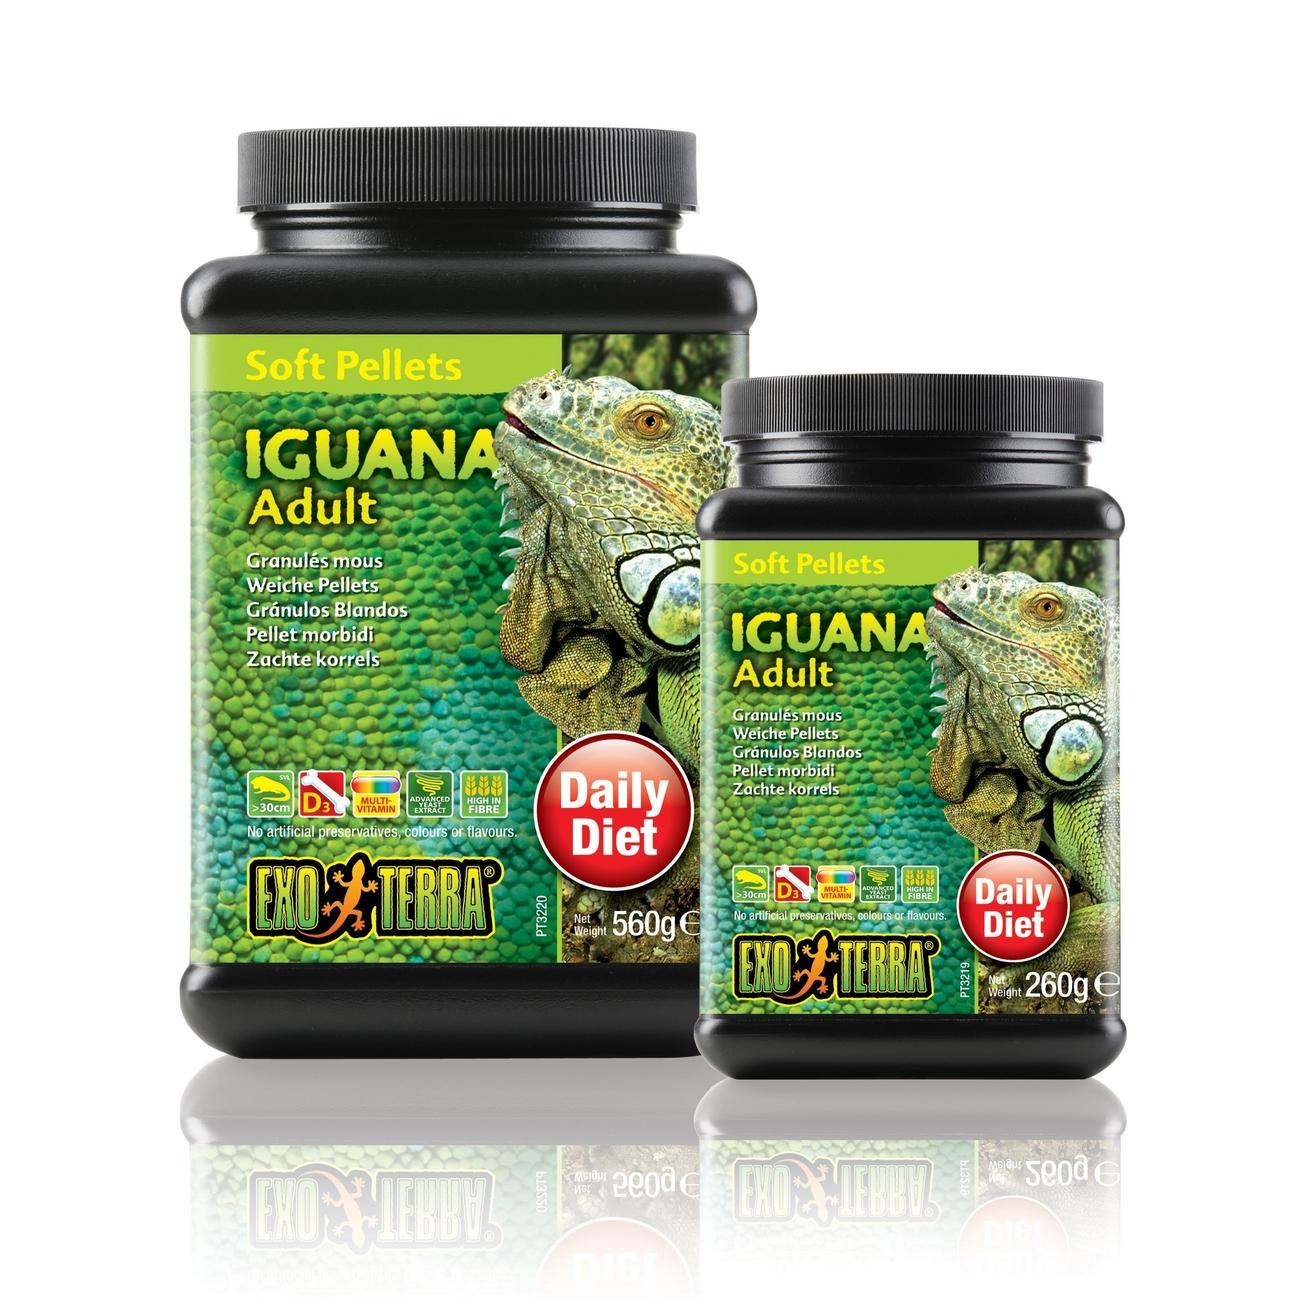 Hagen Exo Terra Futter - Soft Pellets für Leguane, Adult 560 g